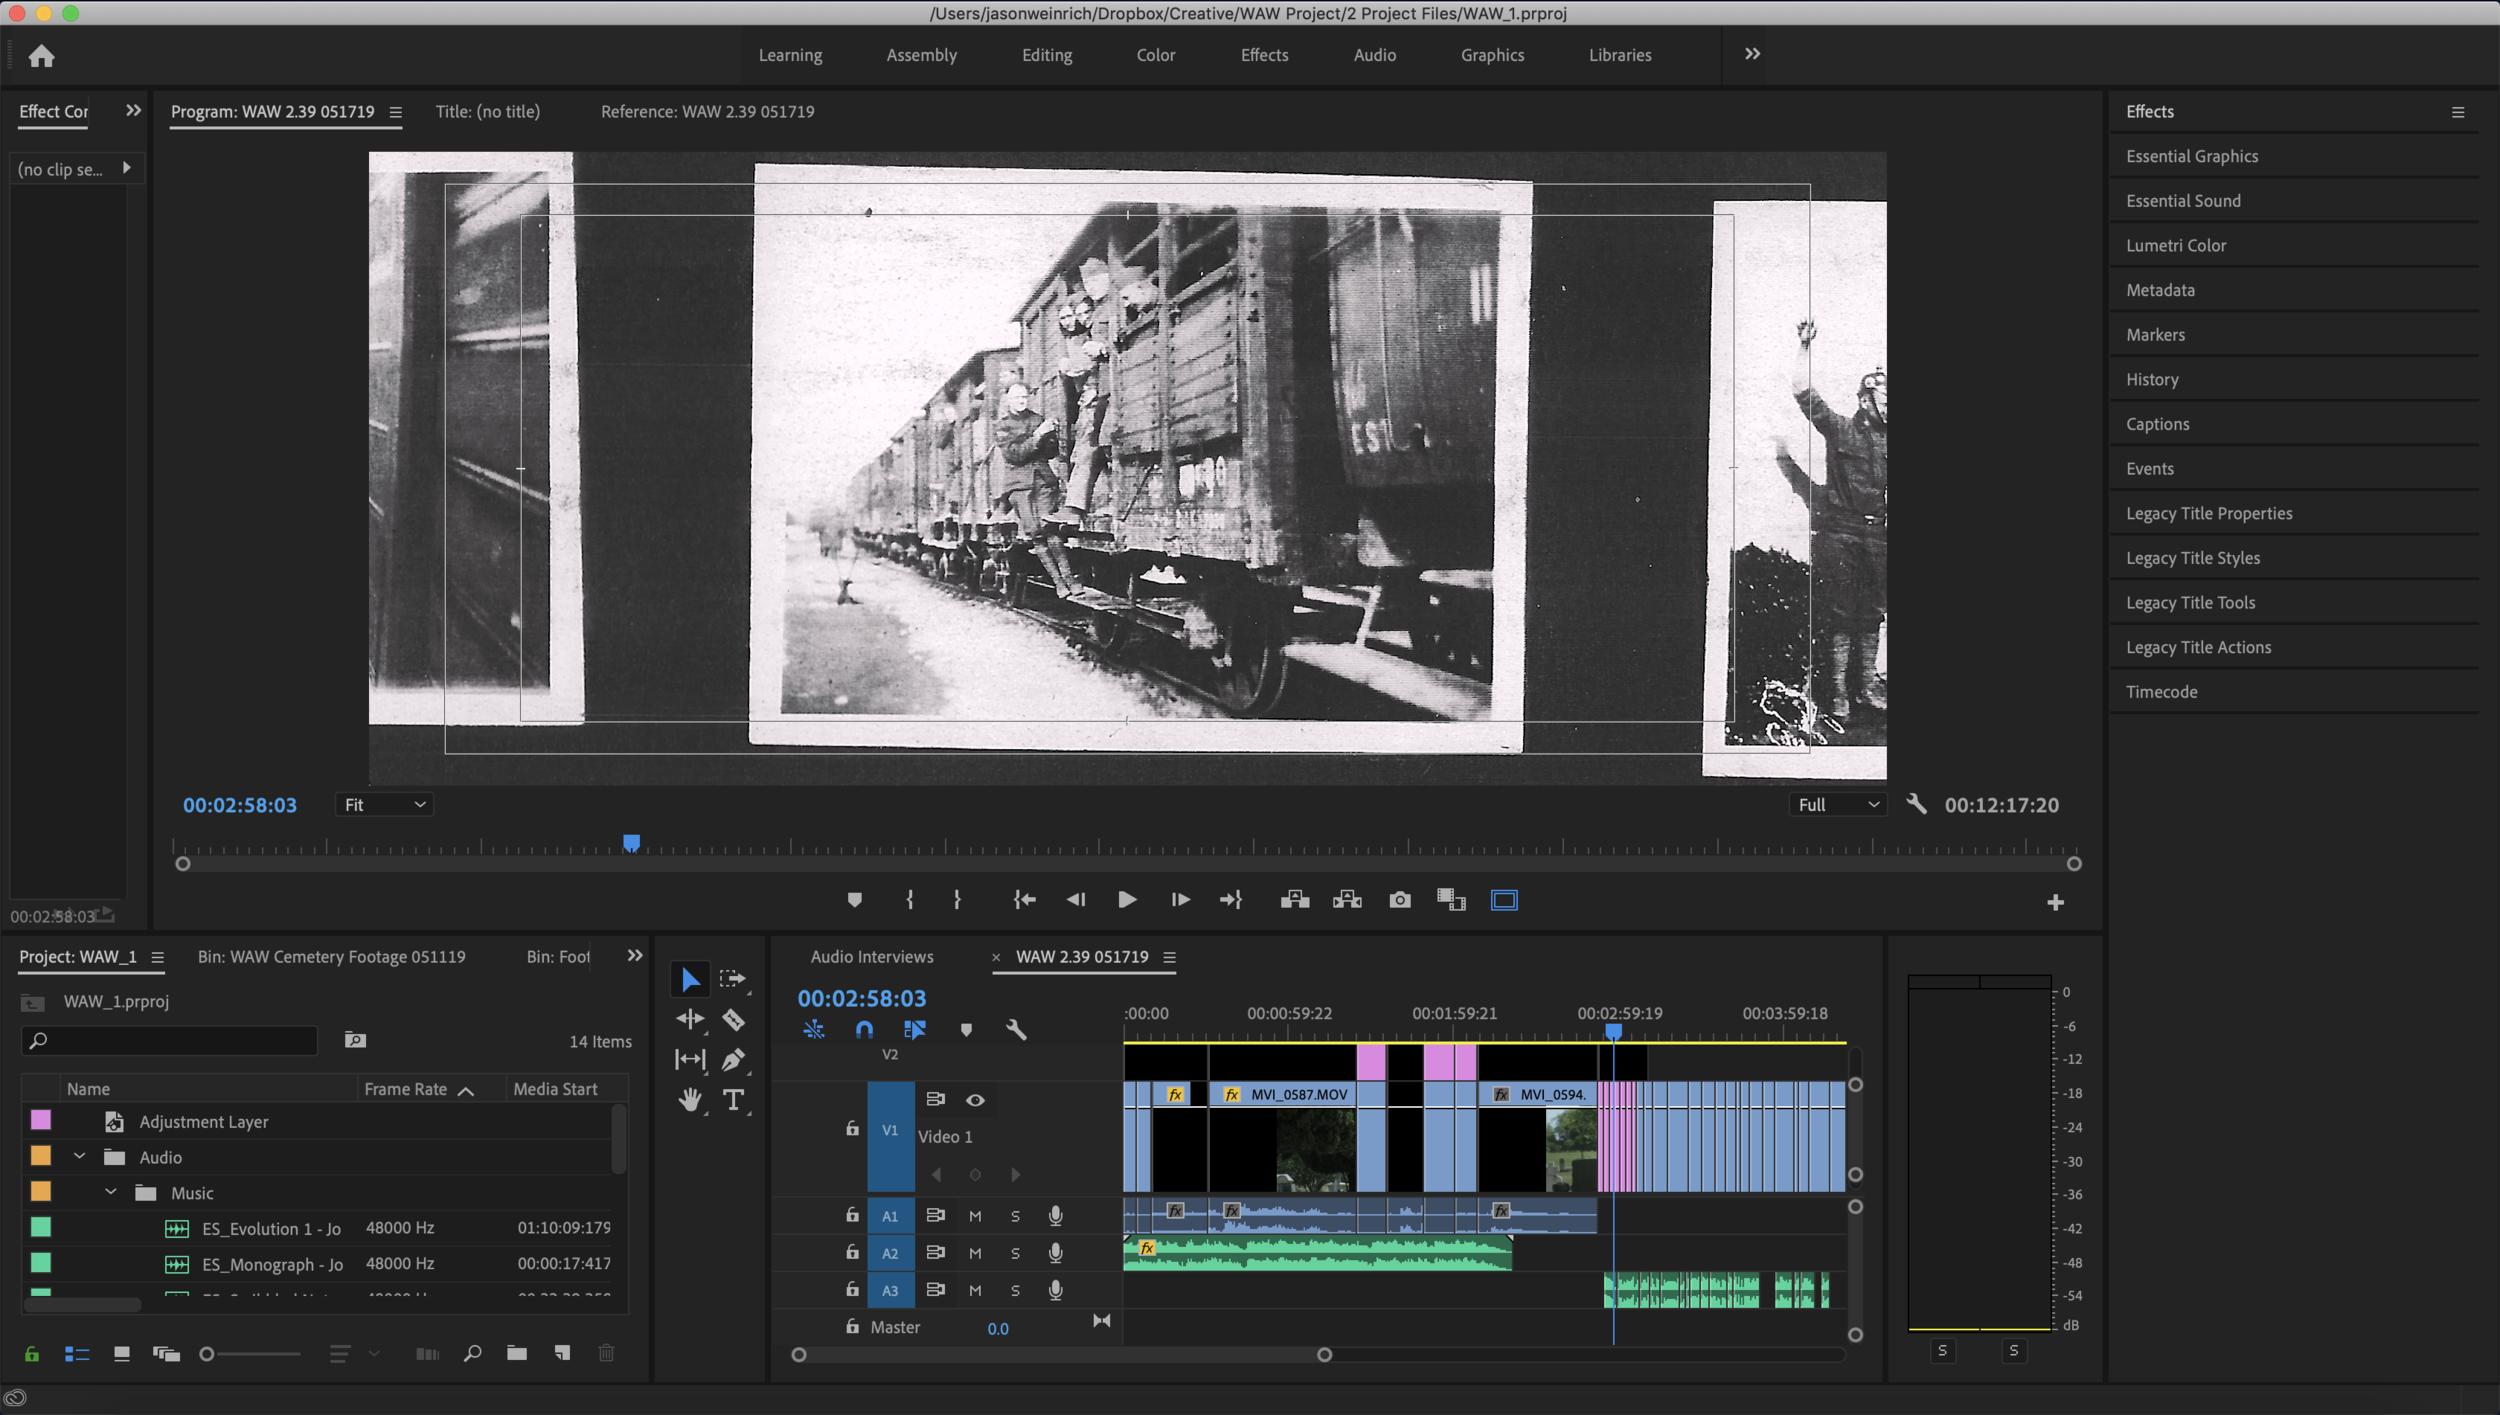 Screenshot of Premiere Pro video editing software.